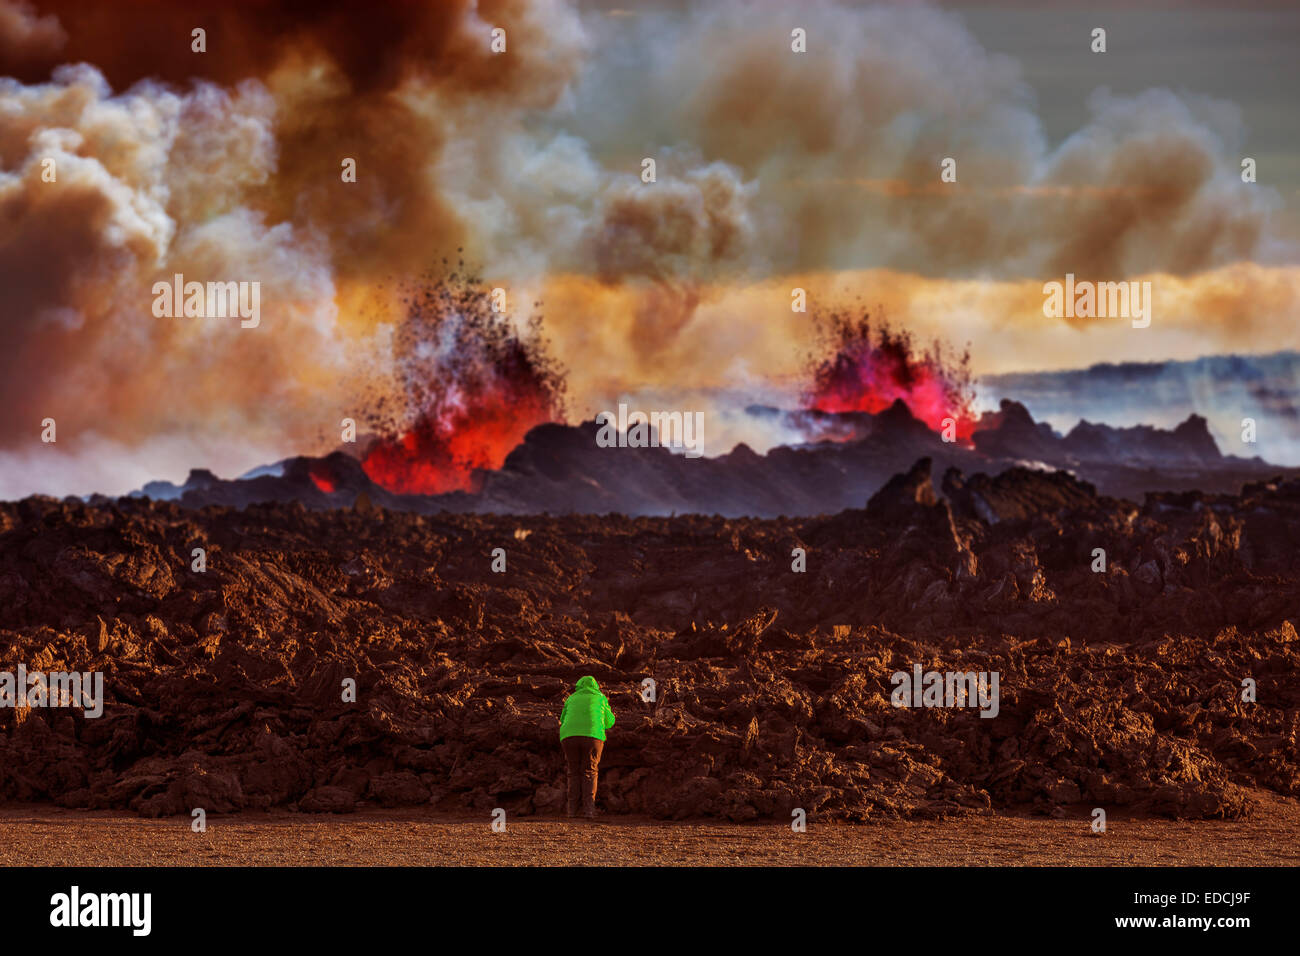 Scientist touching new lava, Holuhraun Fissure Eruption, Bardarbunga Volcano, Iceland - Stock Image